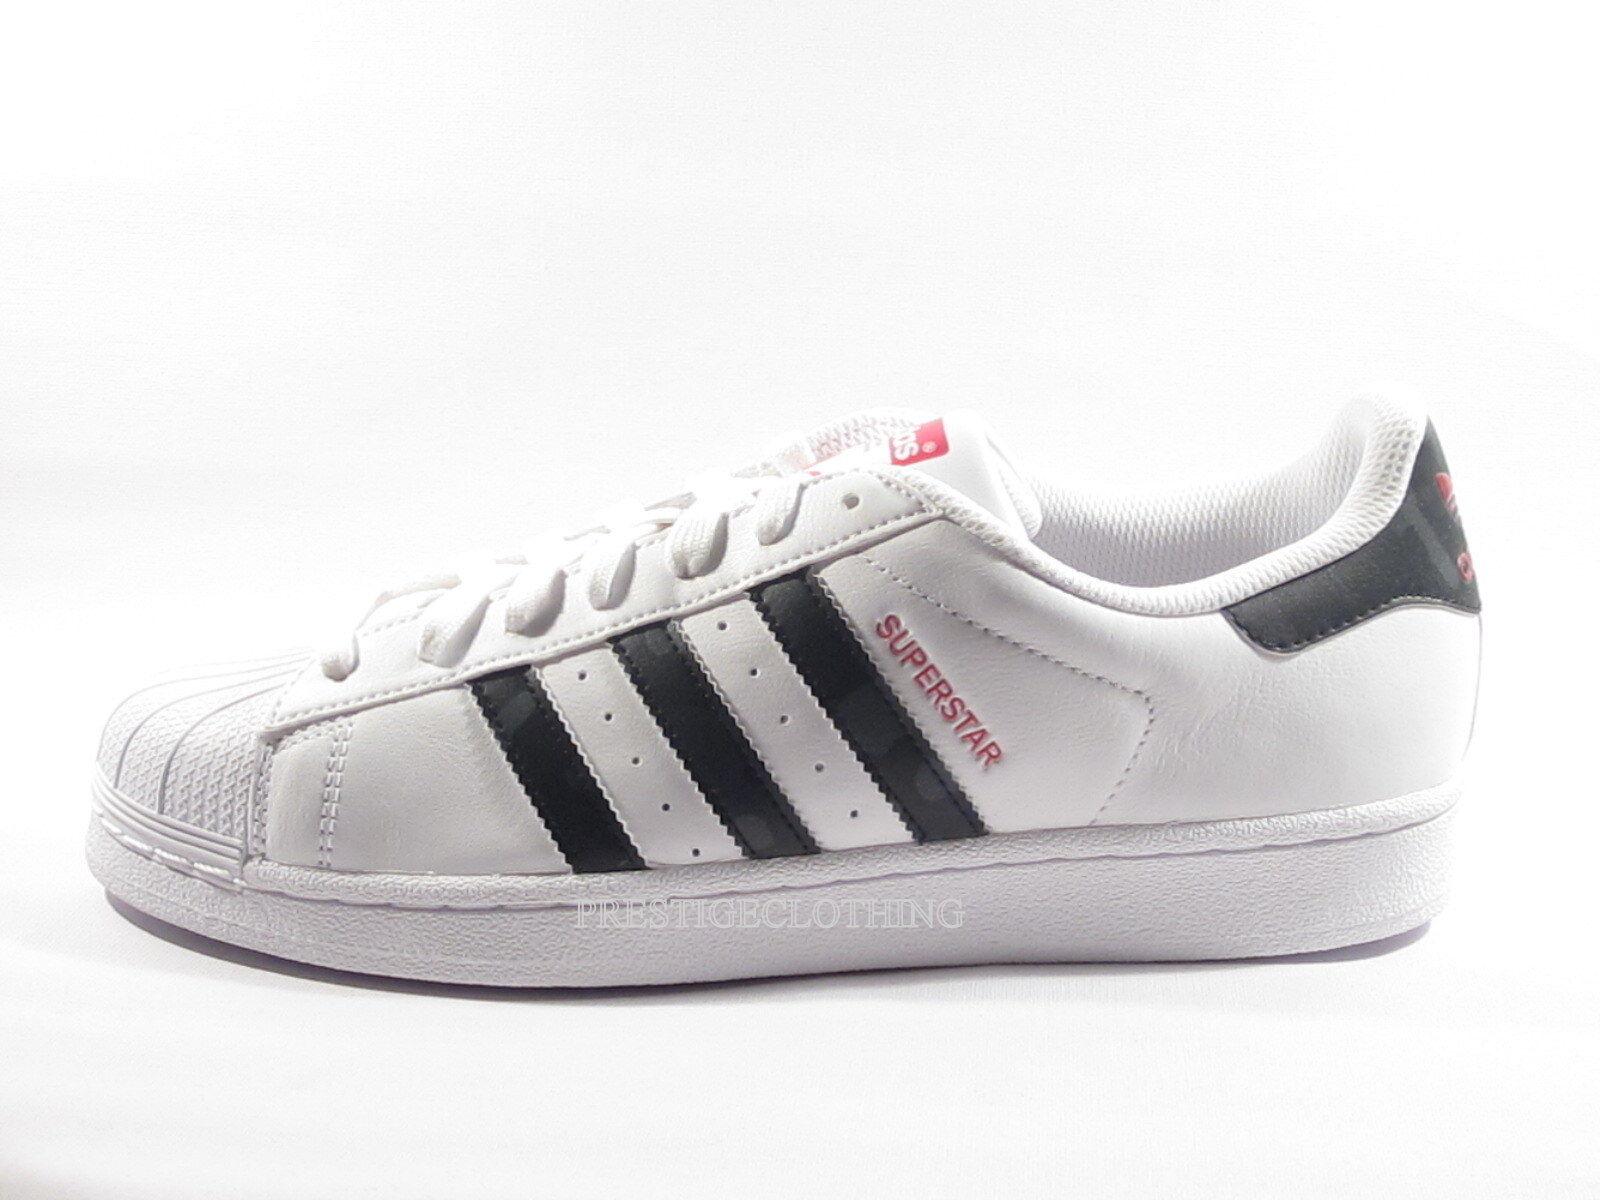 Original Negro Adidas Superstar Camo Blanco Negro Original Rojo Cuero formadores aq2349 02ad28